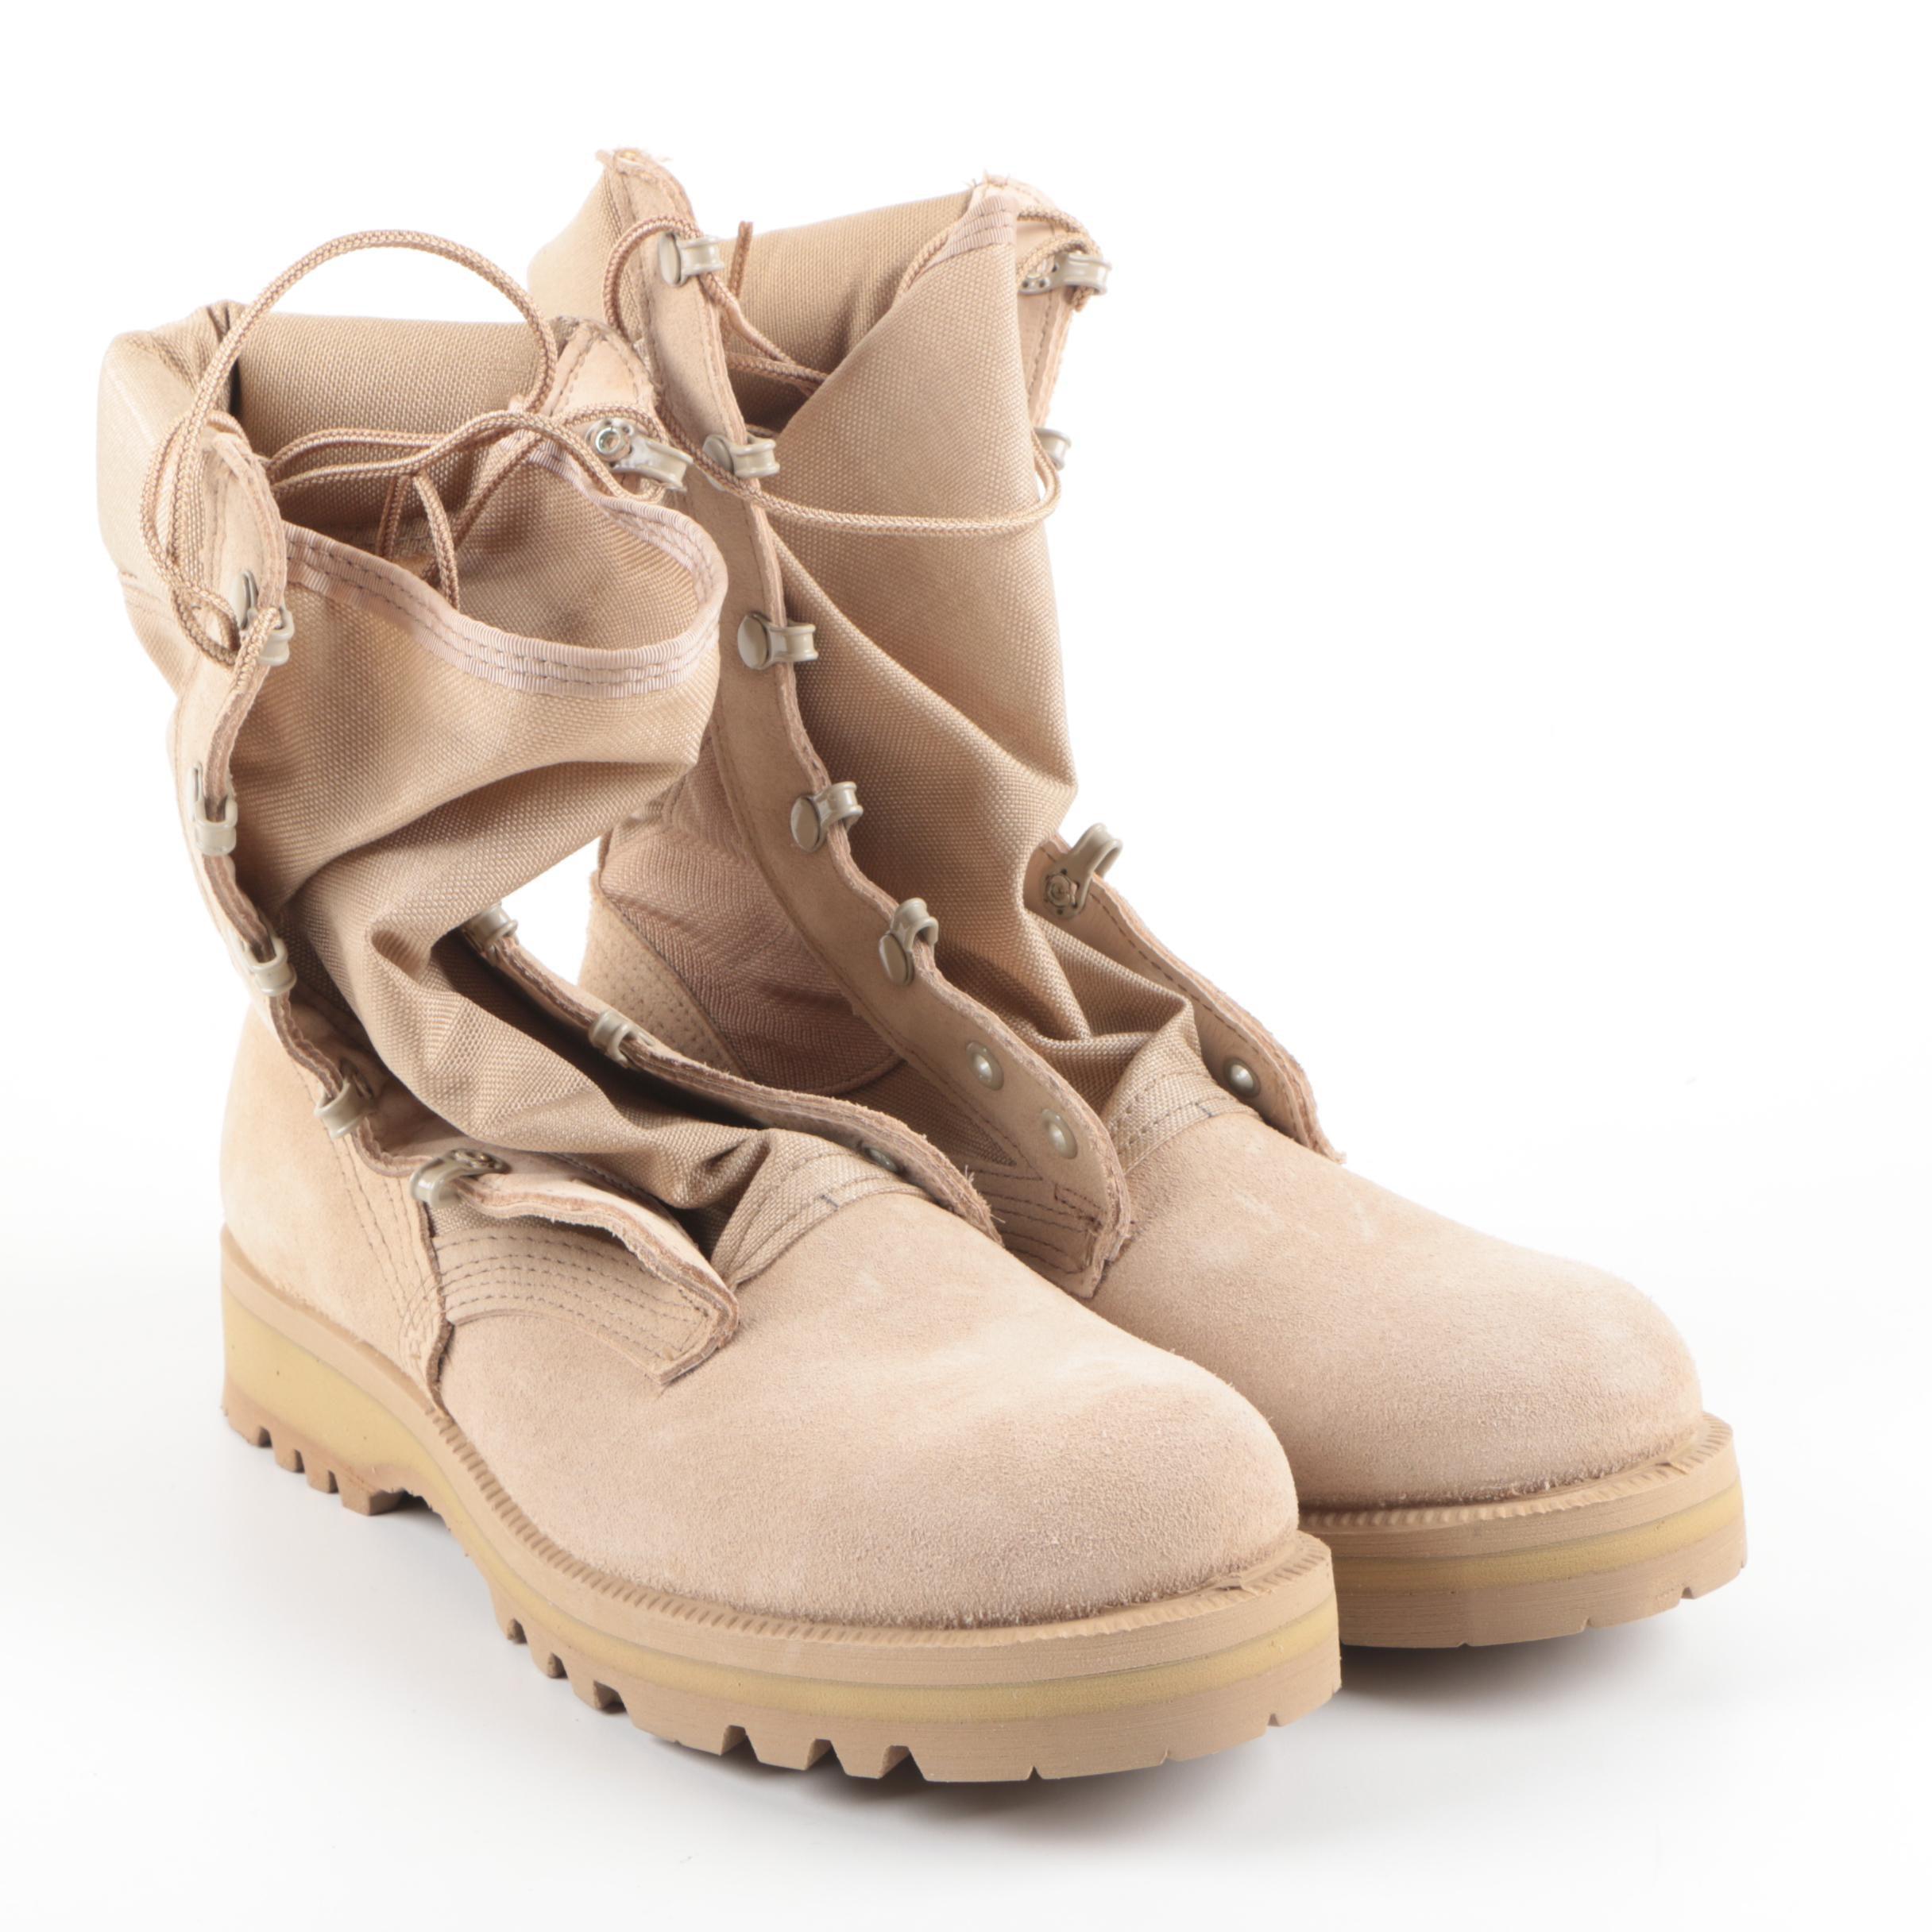 Vibram Sole Combat Boots